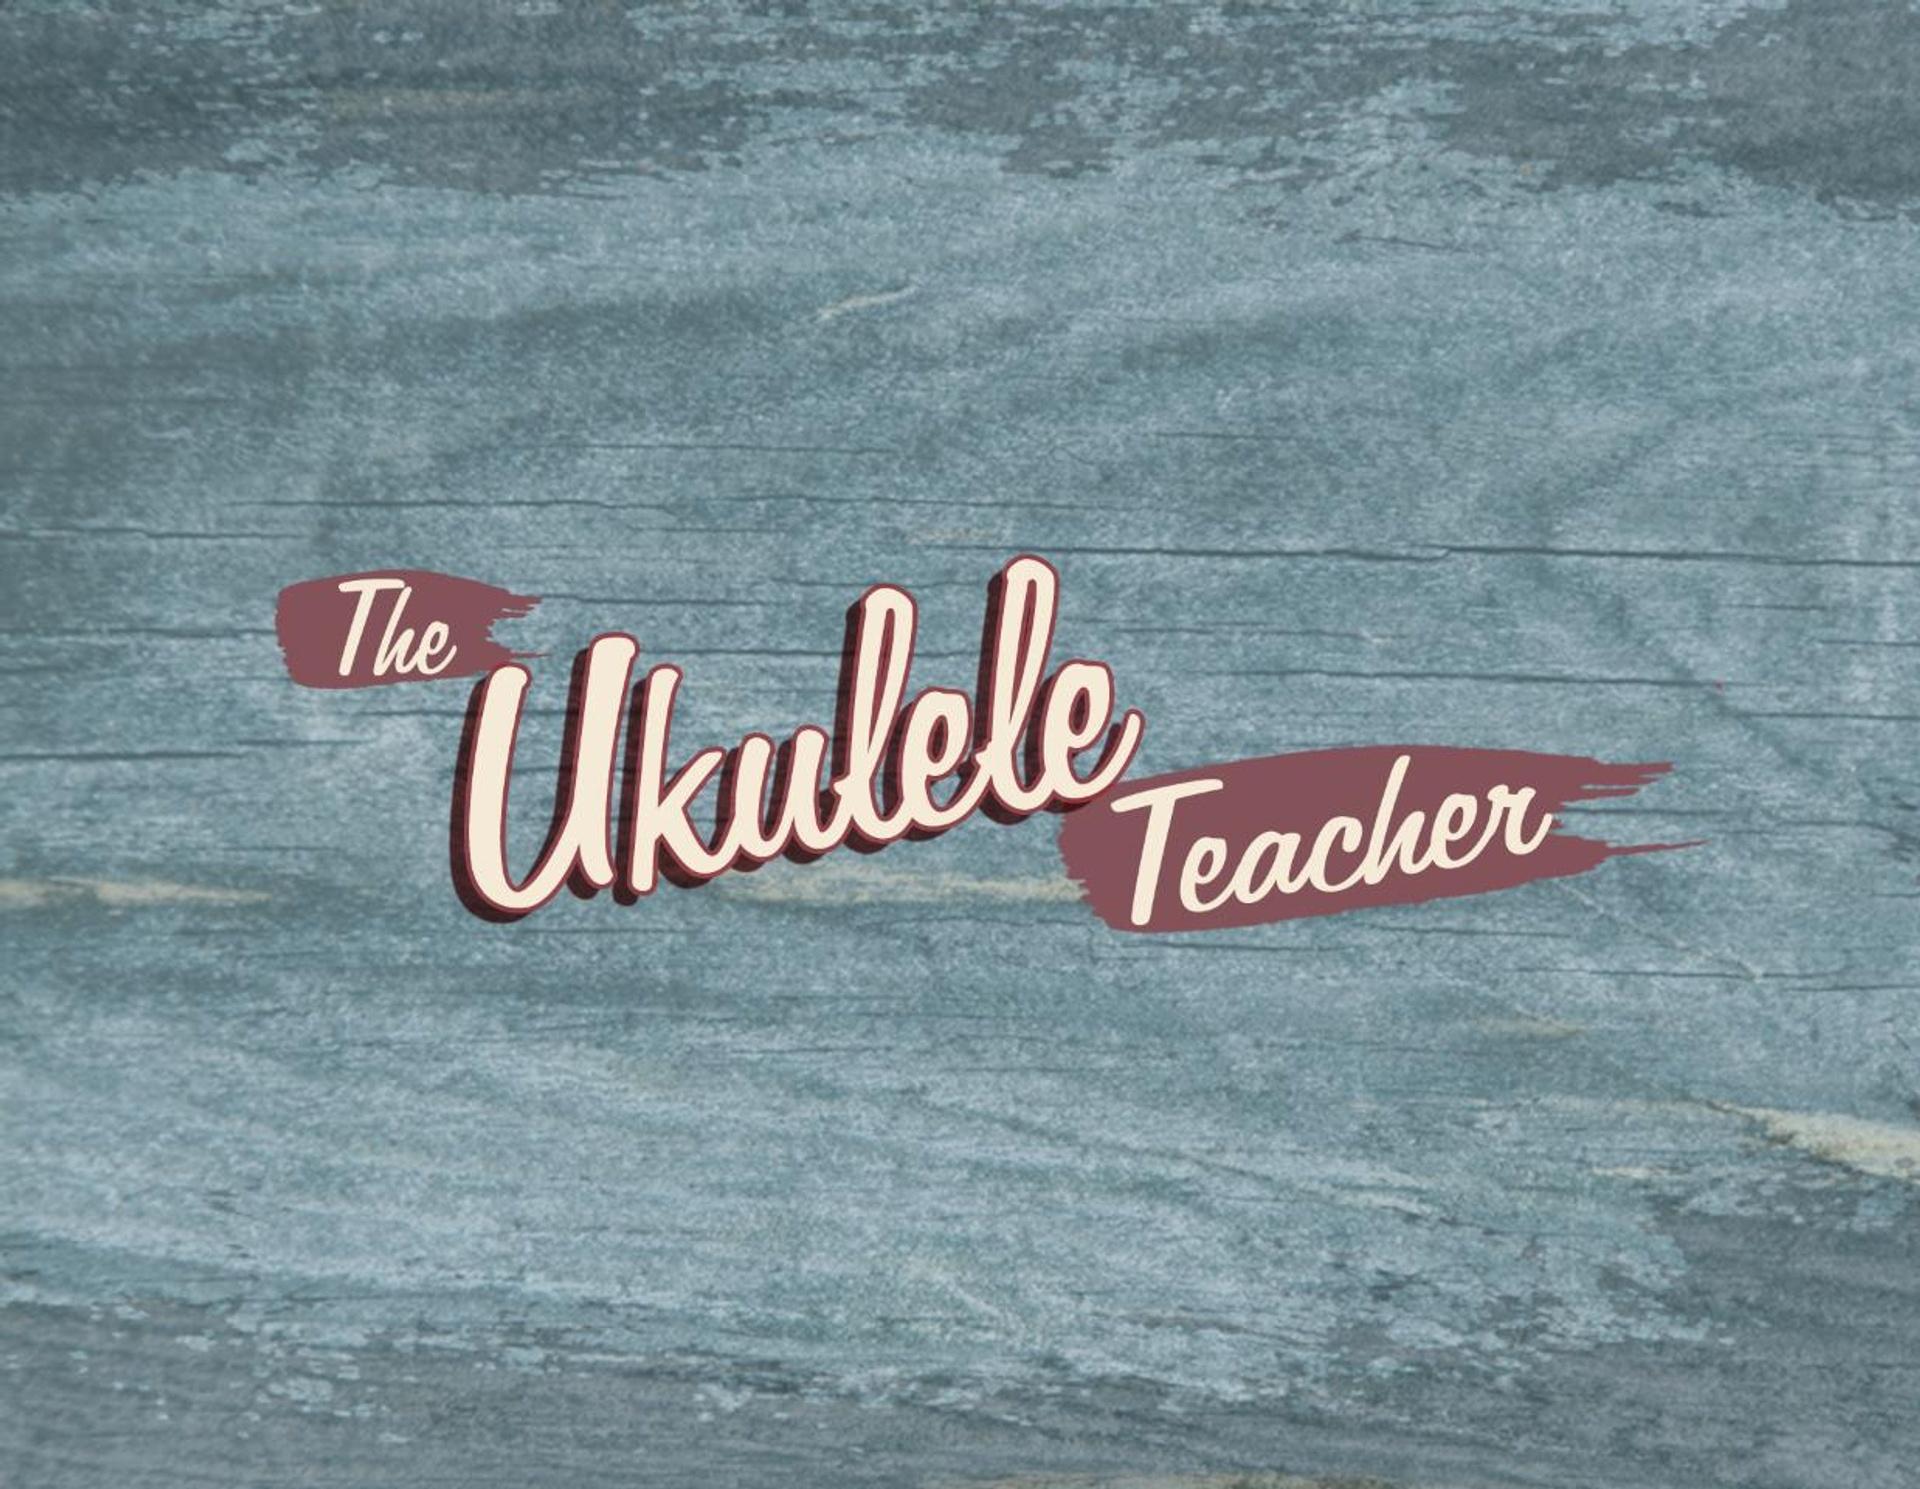 The Ukulele Teacher is creating Ukulele covers & tutorials